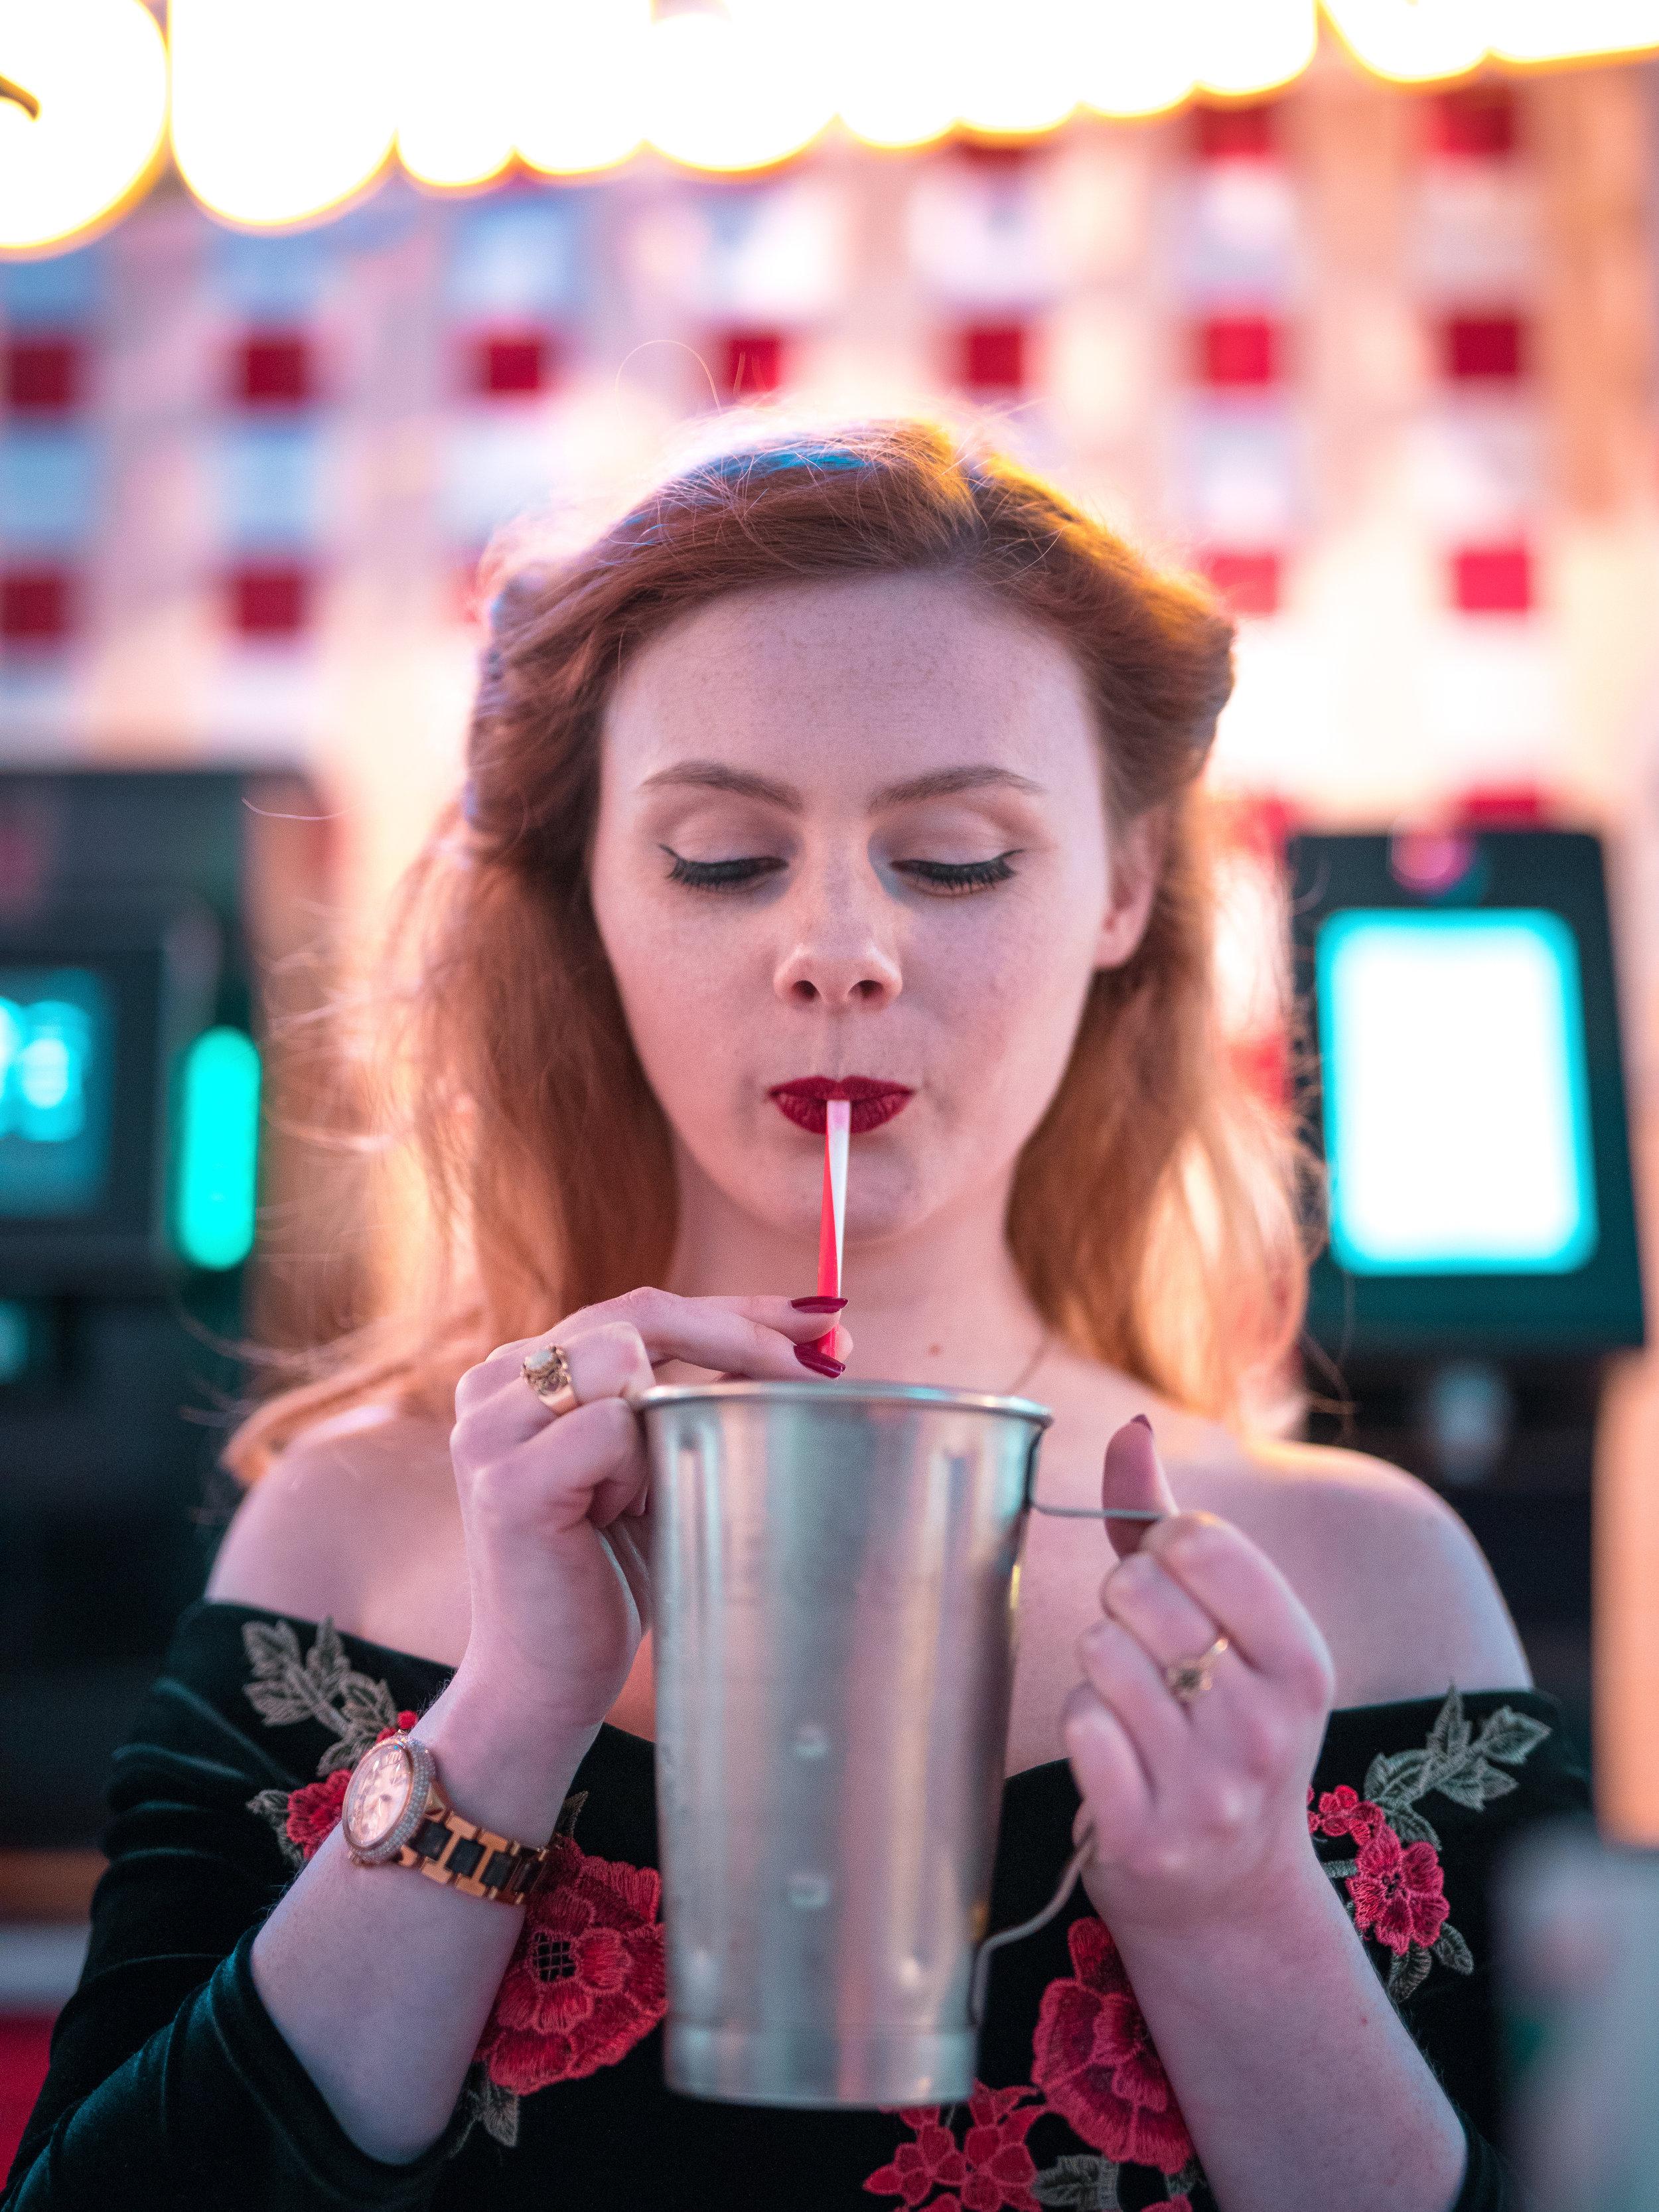 1950s Diner Milkshake Portrait